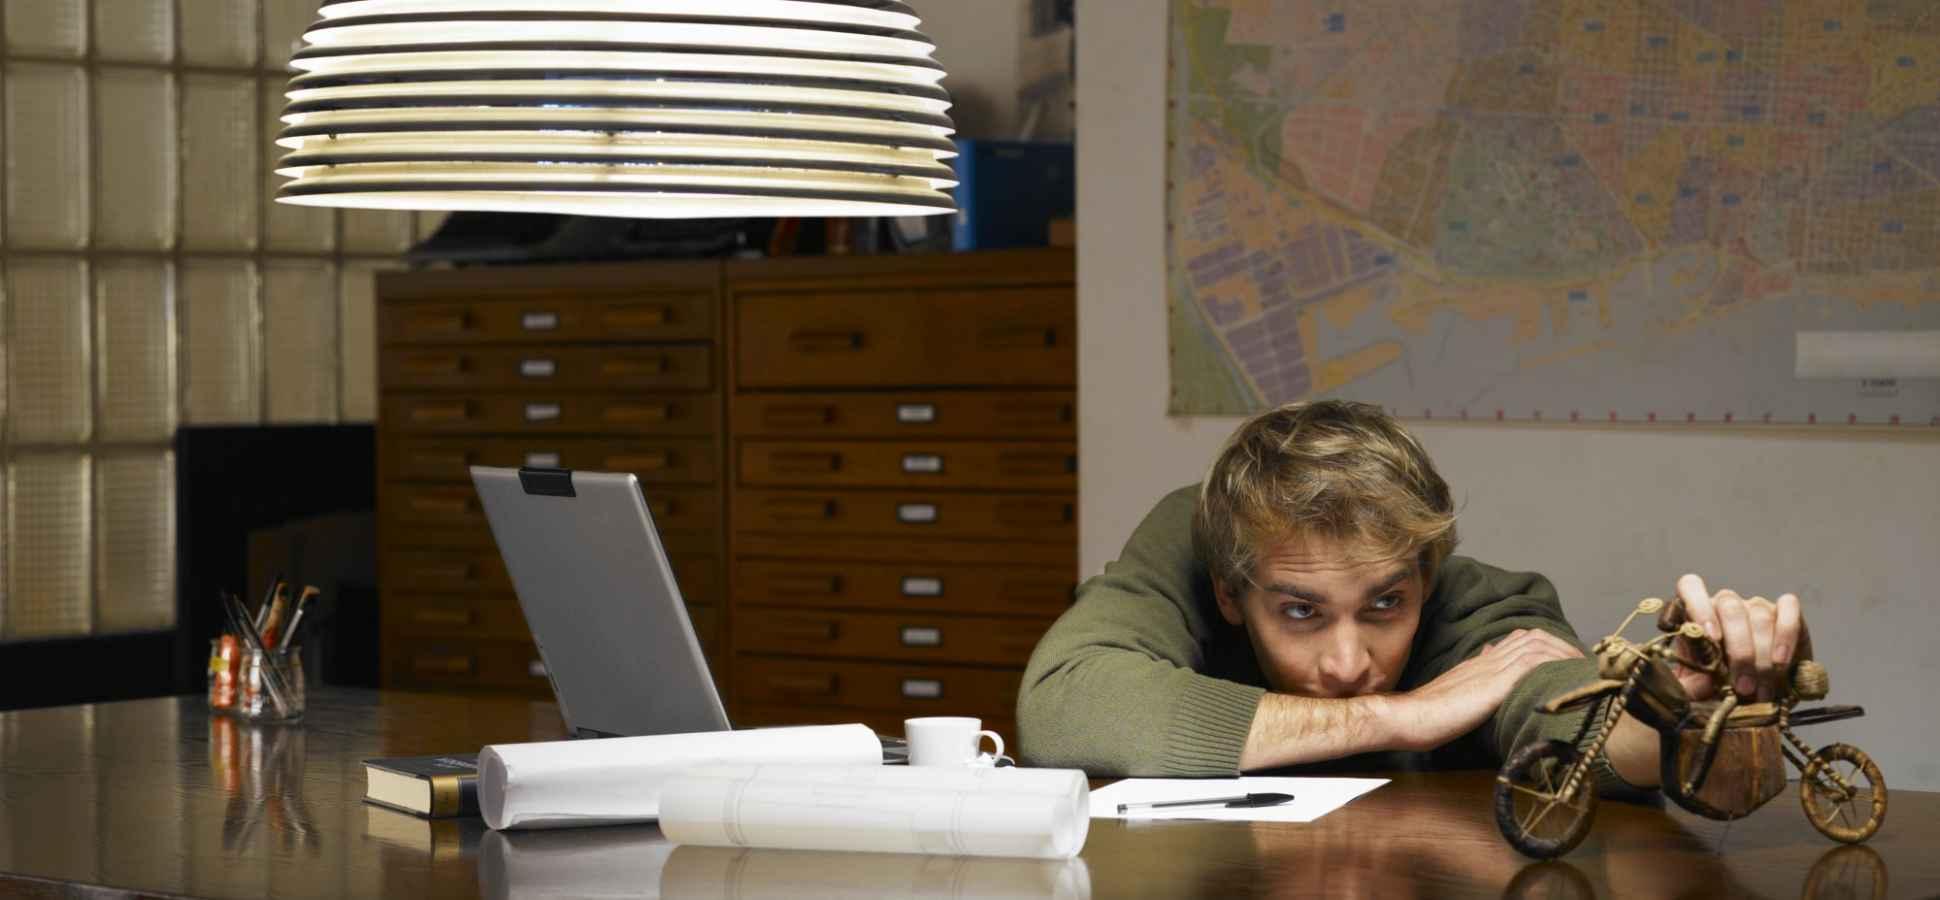 This Epic Flowchart on Procrastination Applies to Pretty Much Everyone, Always